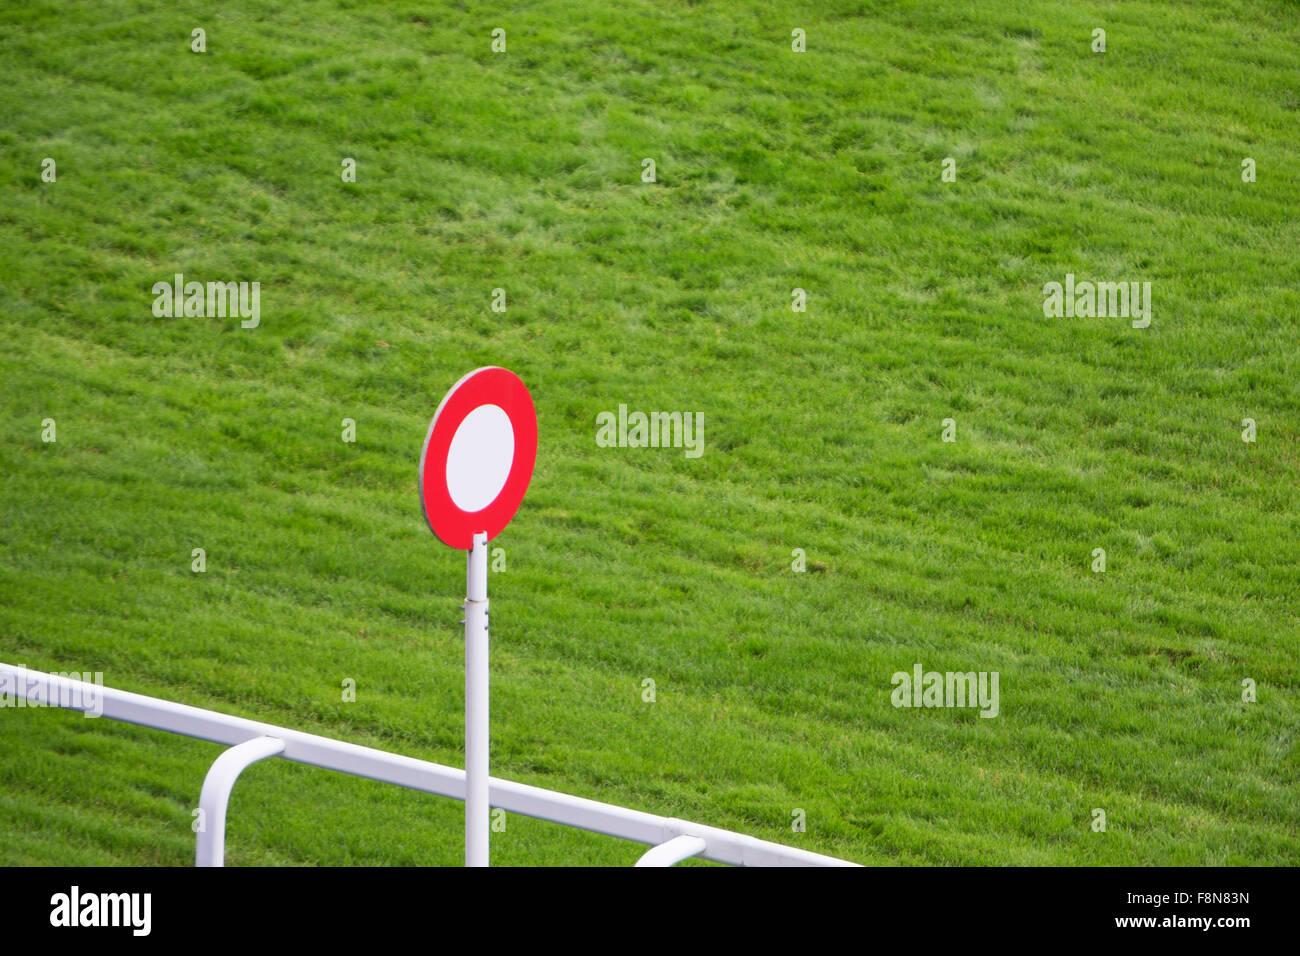 Acabado Post sobre pista de carreras de caballos Imagen De Stock